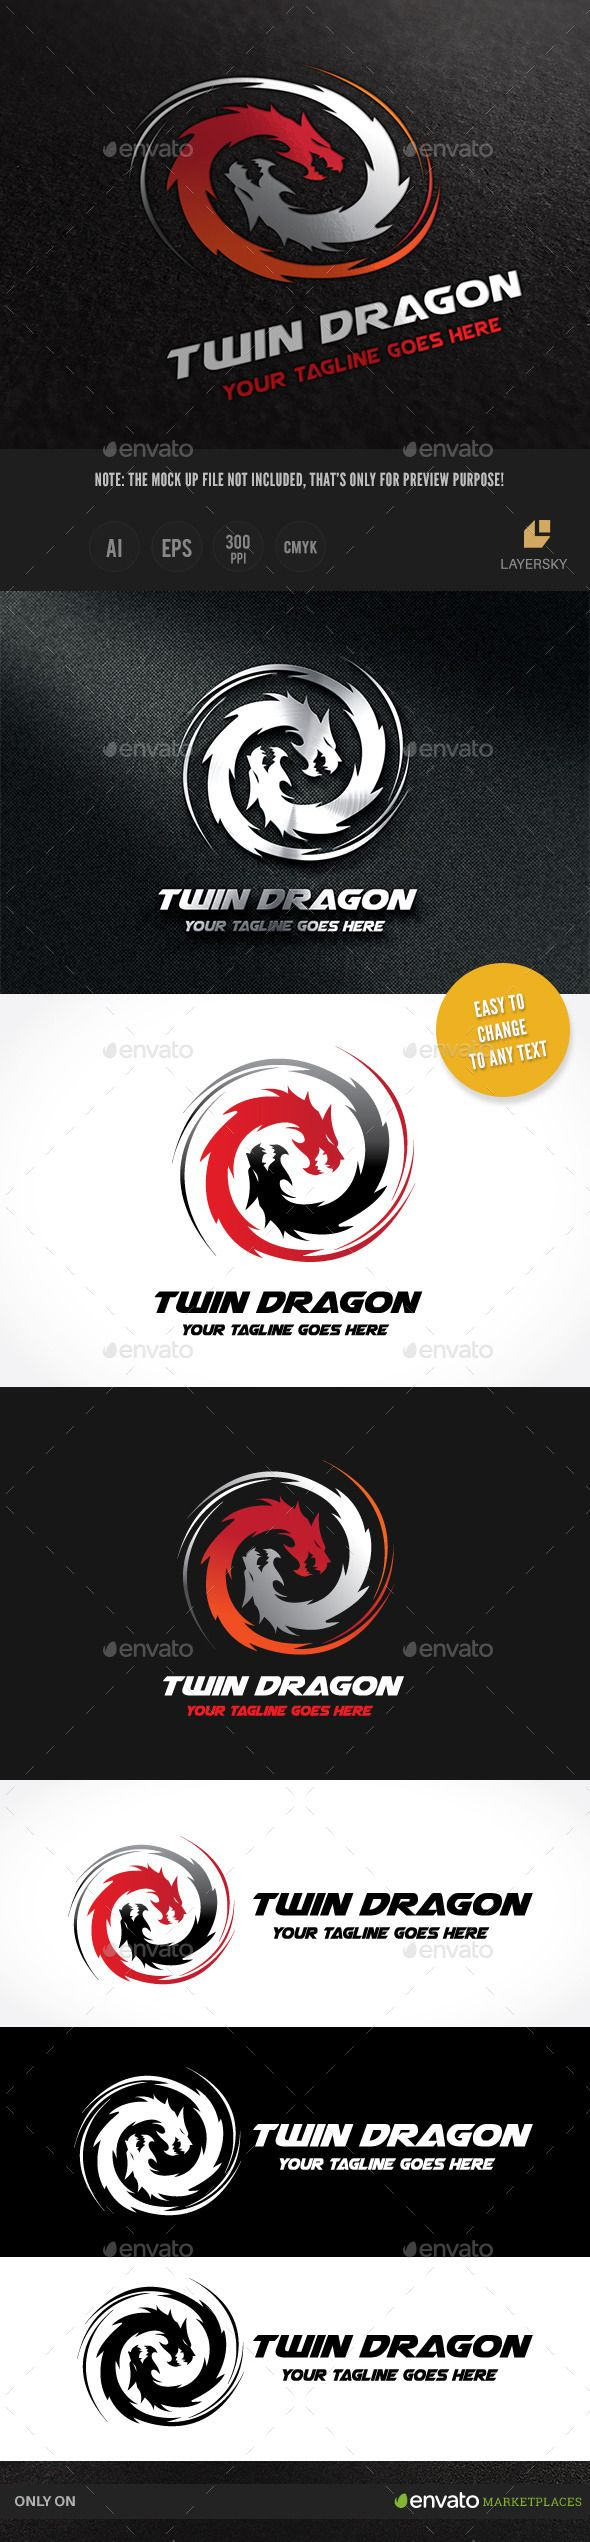 Dragon Twin Logo Template #design Download: http://graphicriver.net/item/dragon-twin-/10015406?ref=ksioks